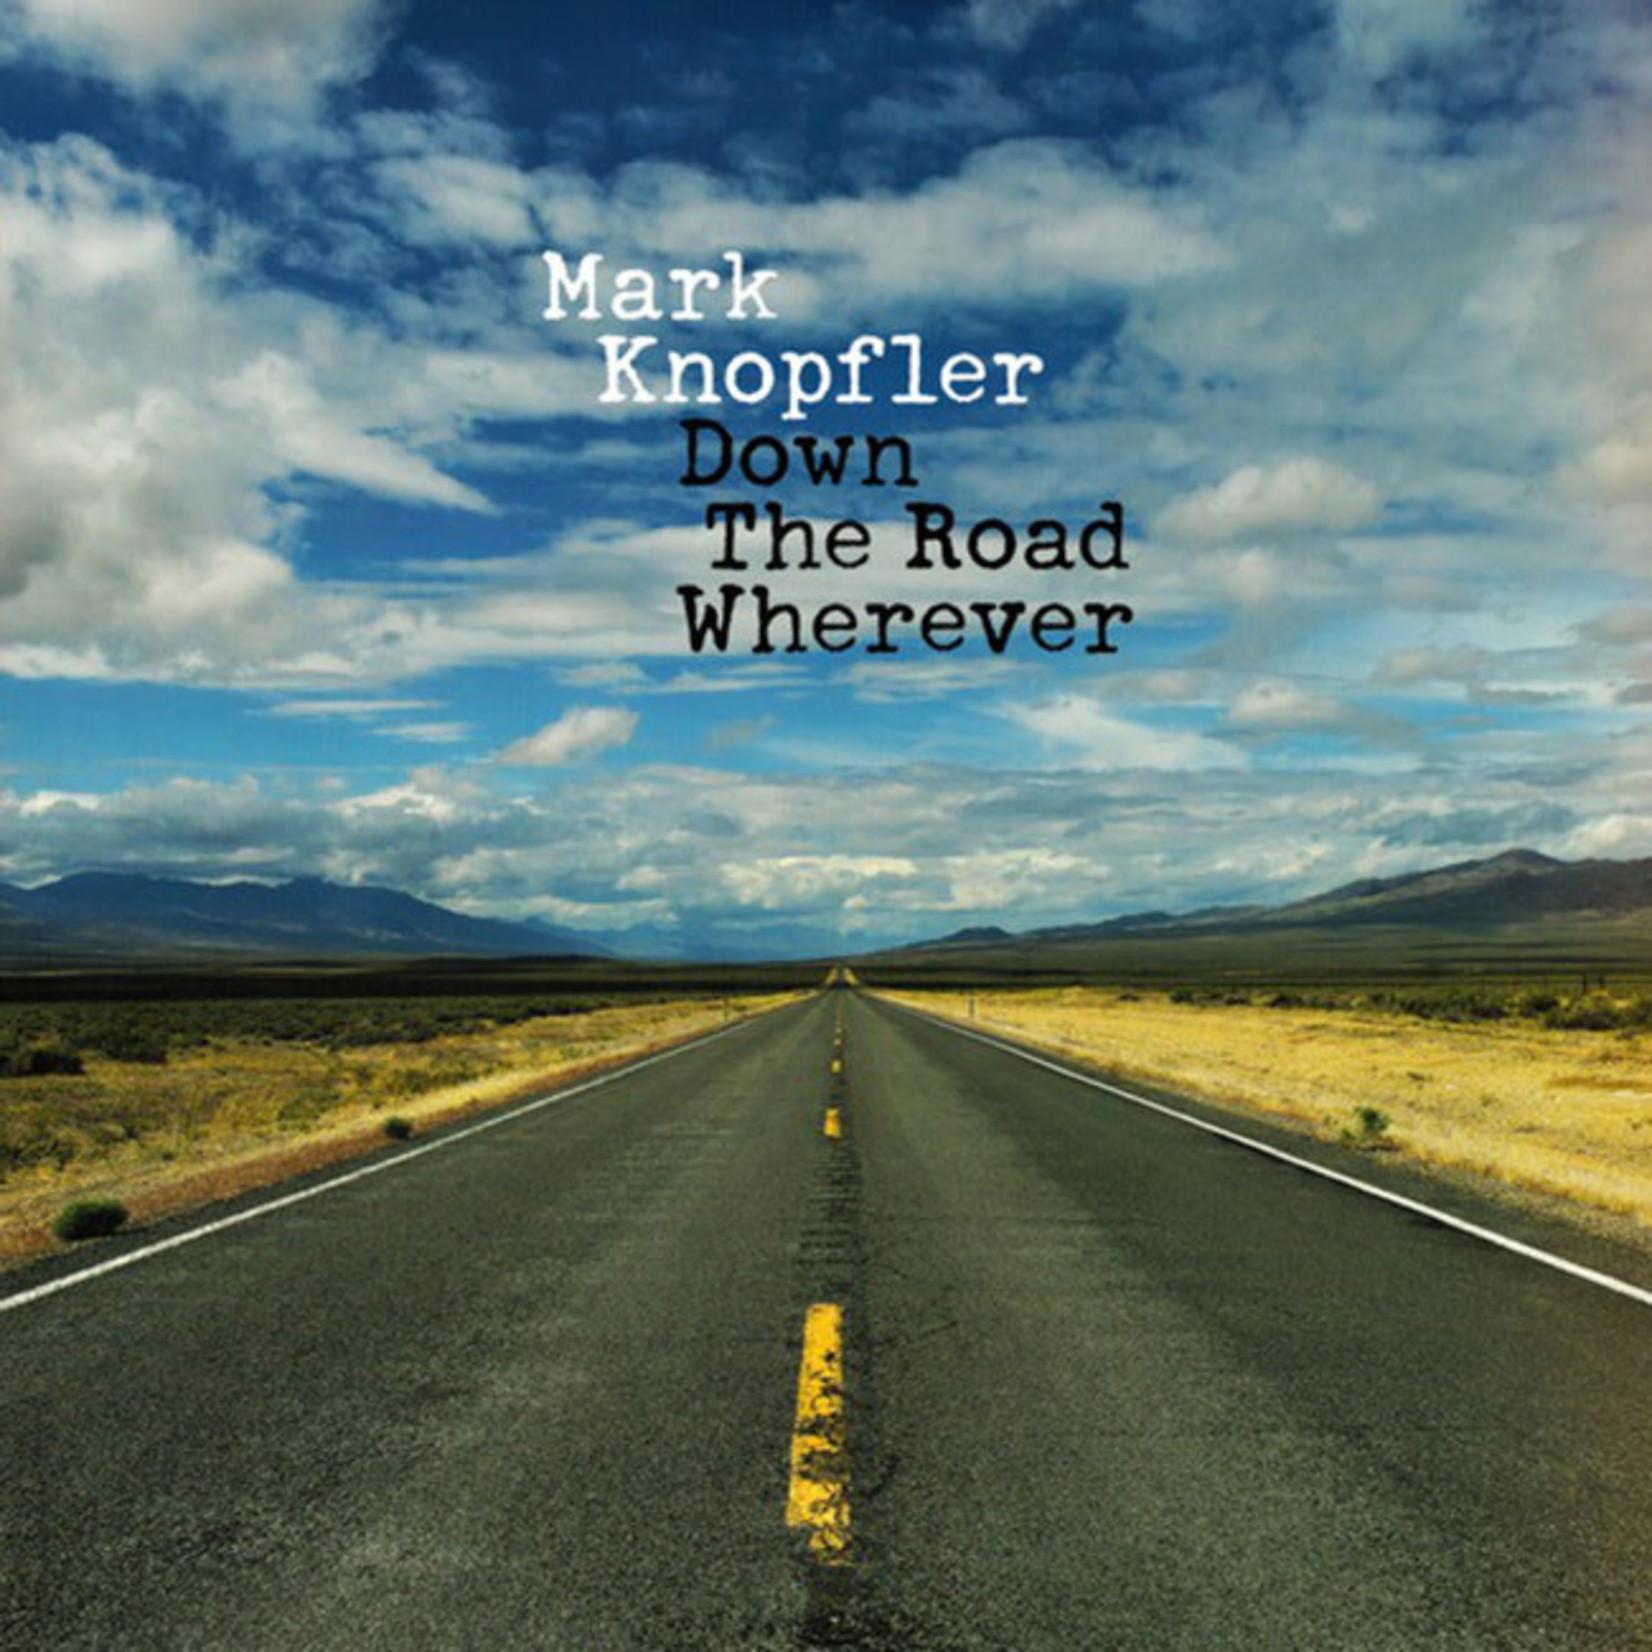 [New] Knopfler, Mark (Dire Straits): Down The Road Wherever